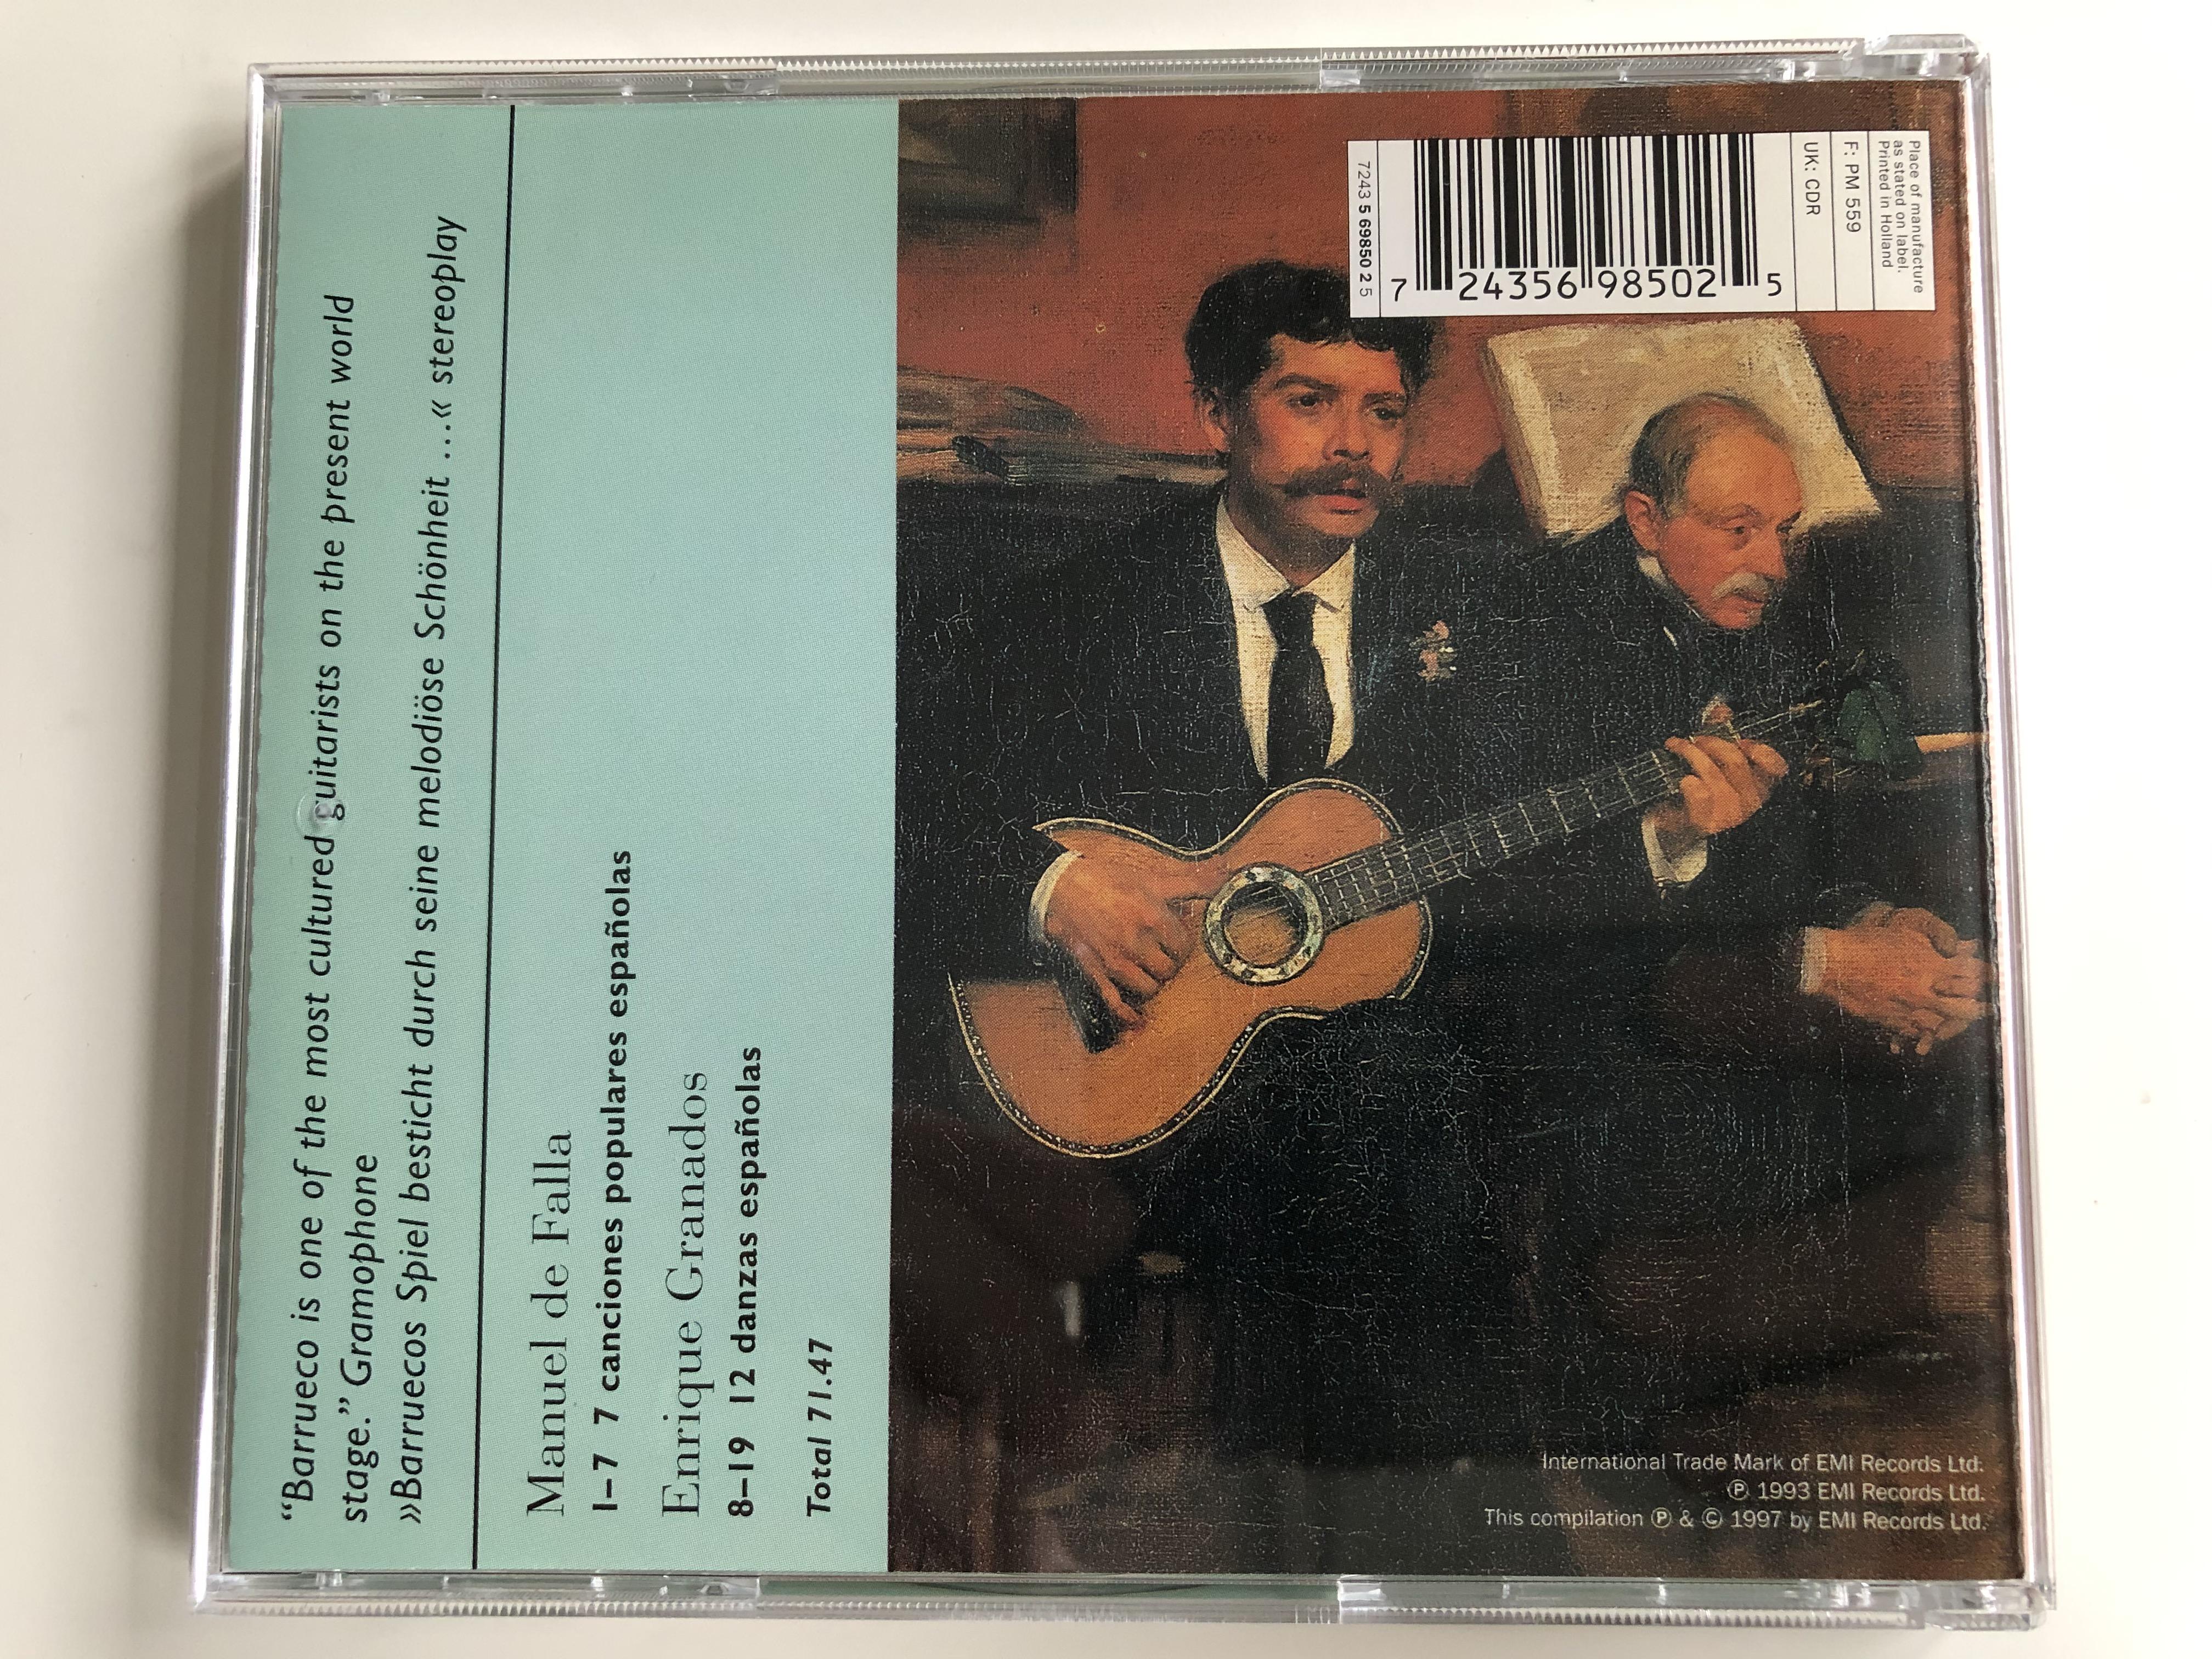 manuel-barrueco-spanish-guitar-recital-de-falla-granados-emi-classic-audio-cd-1997-stereo-724356985025-4-.jpg